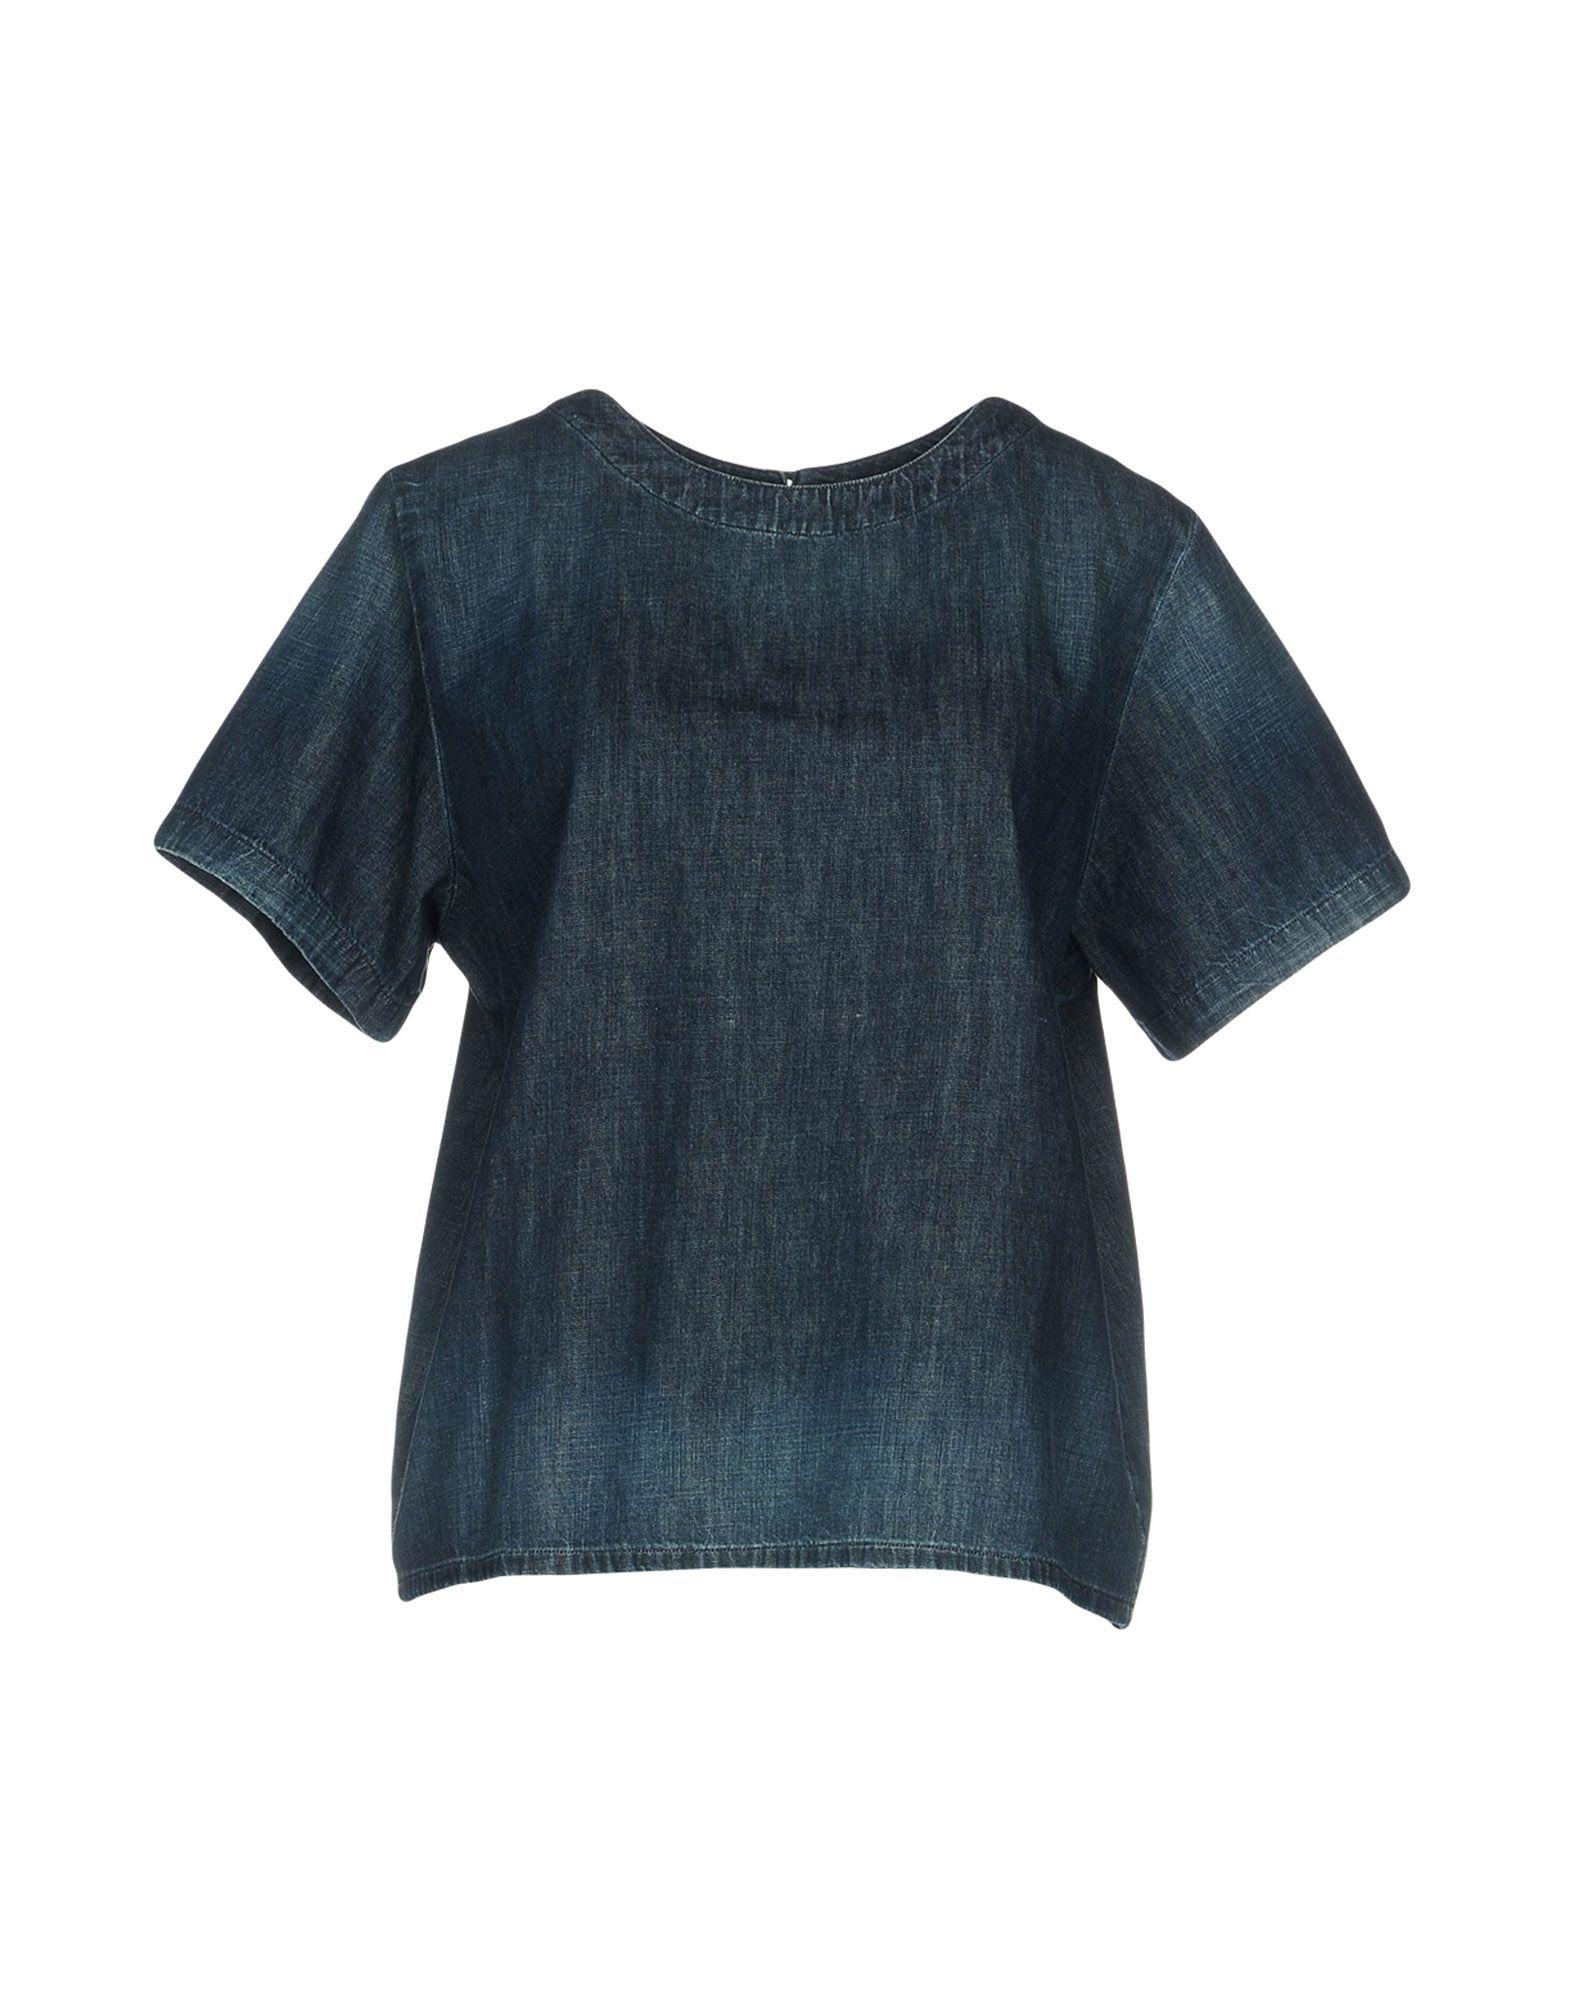 Camicia Jeans Golden Goose Deluxe Brand Donna - Acquista online su RLQwff28